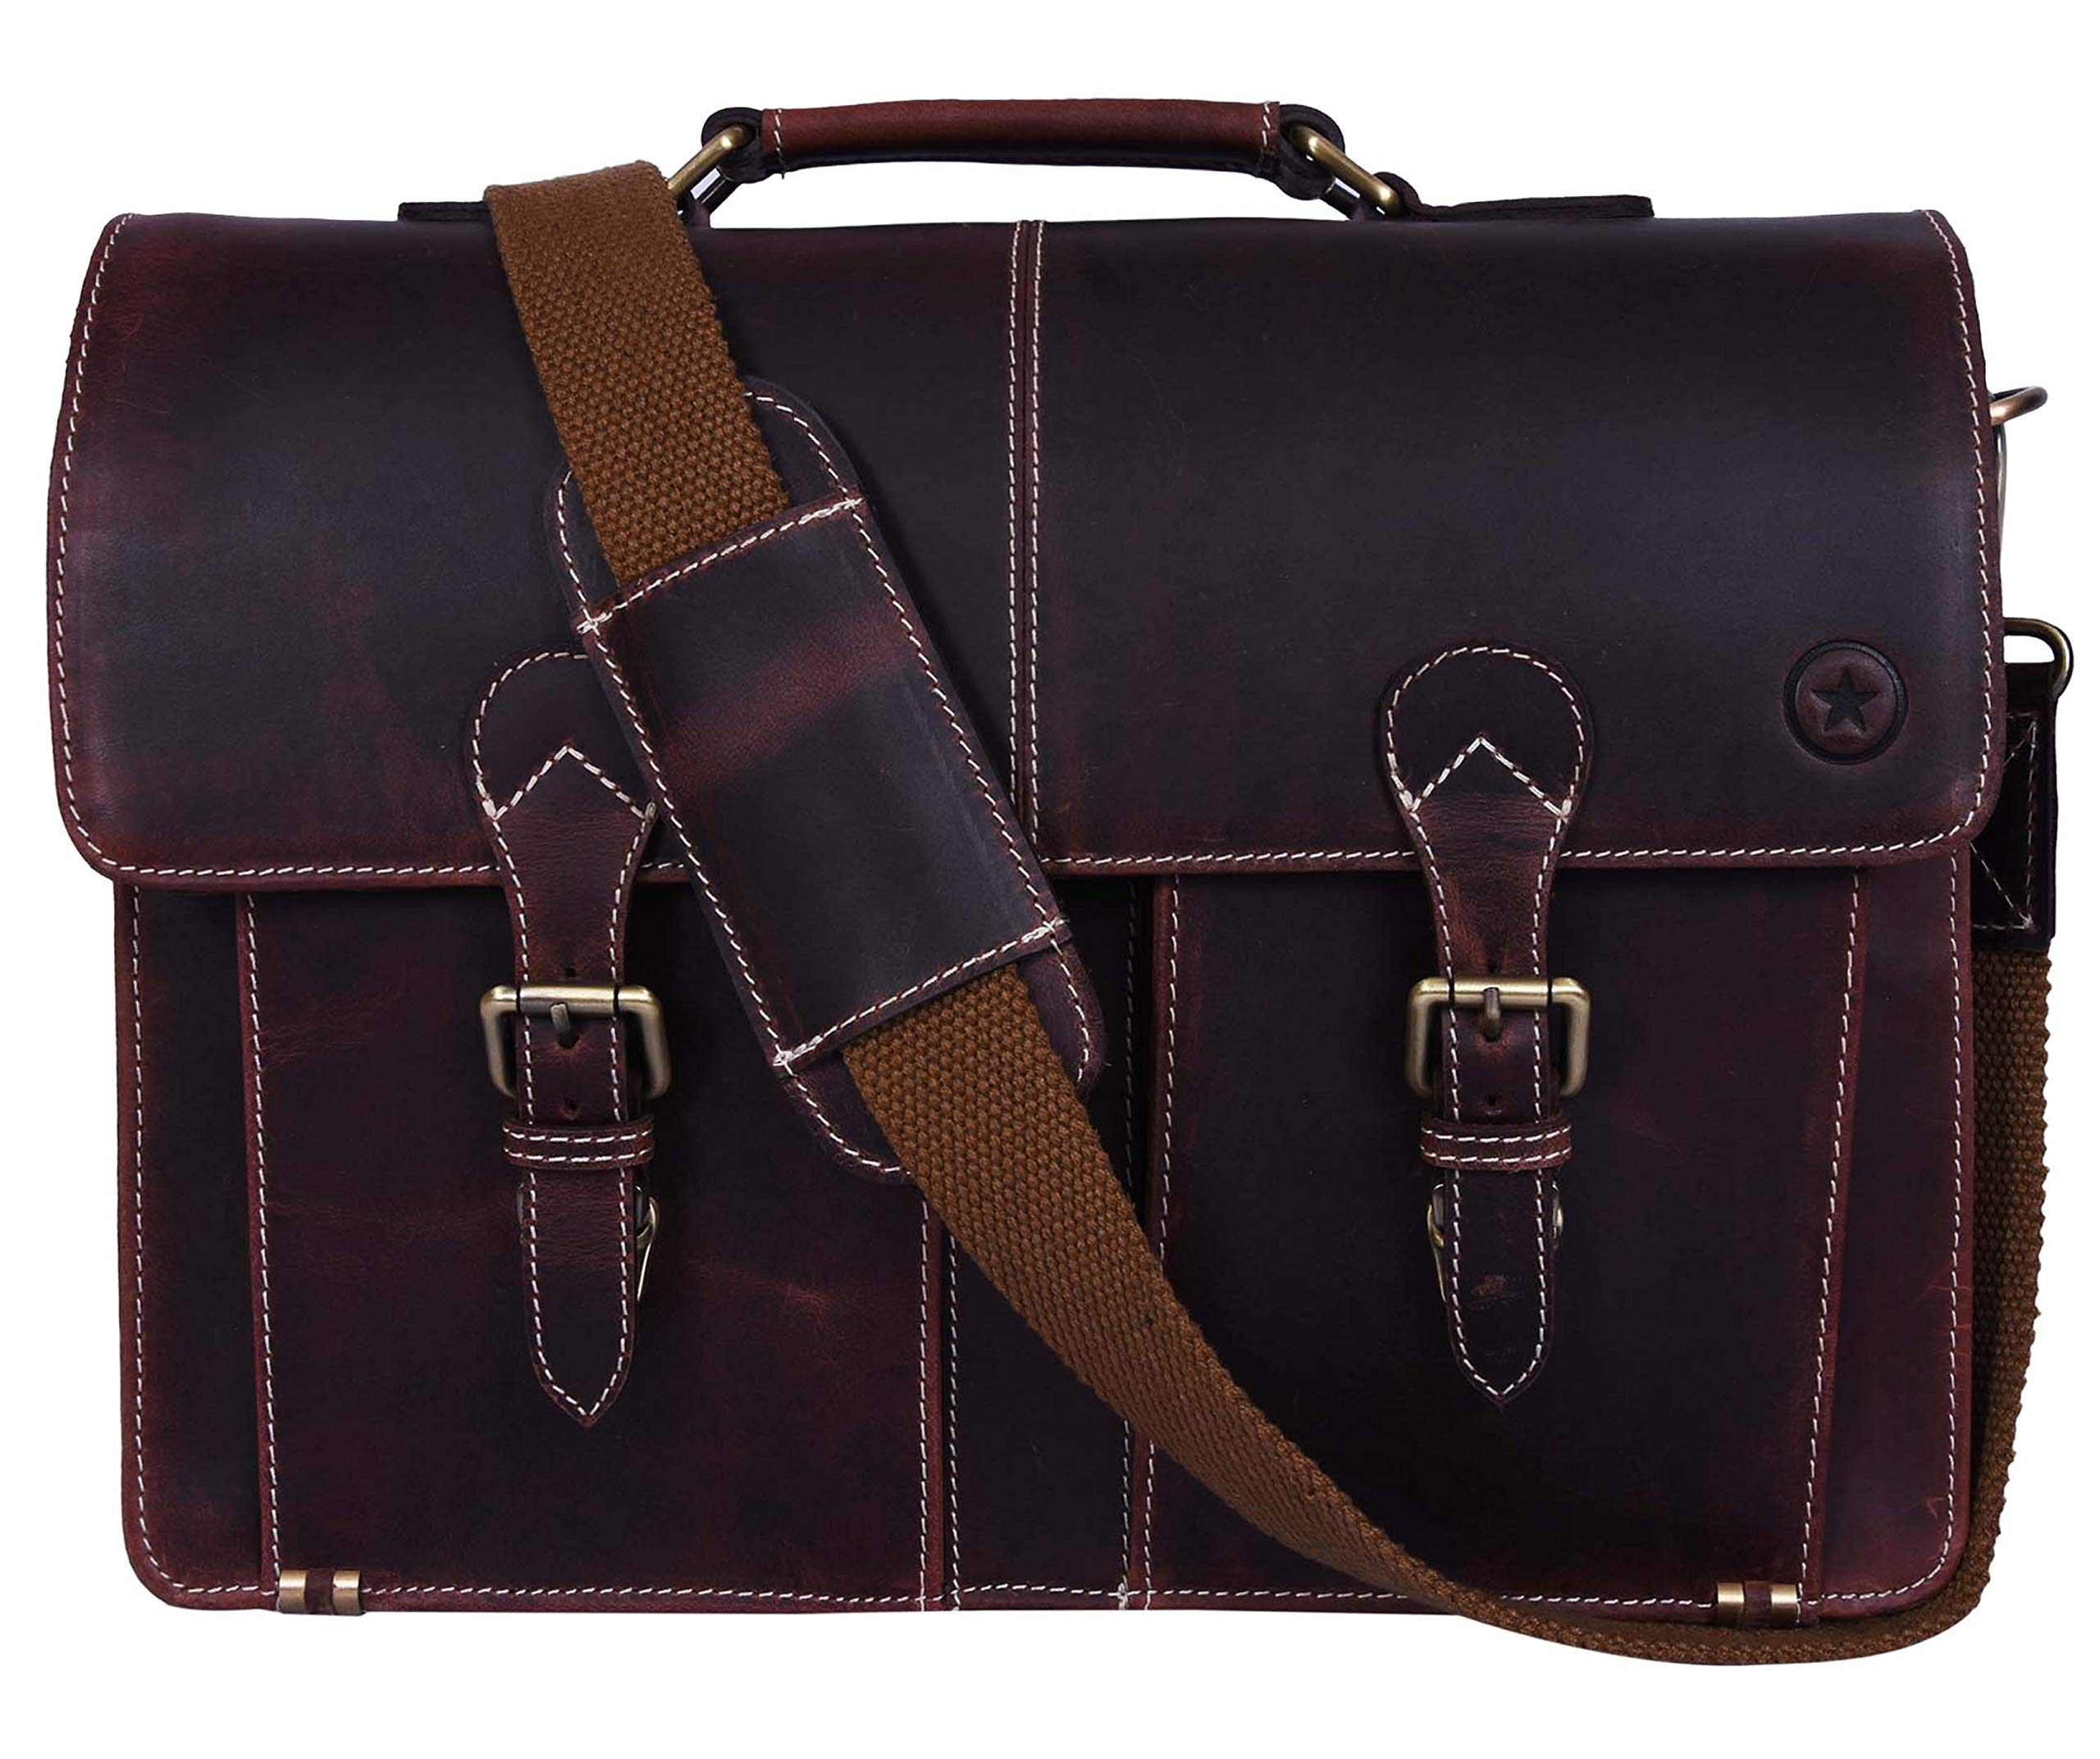 15.5'' Leather Briefcase Messenger Bag for Laptop by Aaron Leather (Walnut) by AARON LEATHER GOODS VENDIMIA ESTILO (Image #1)